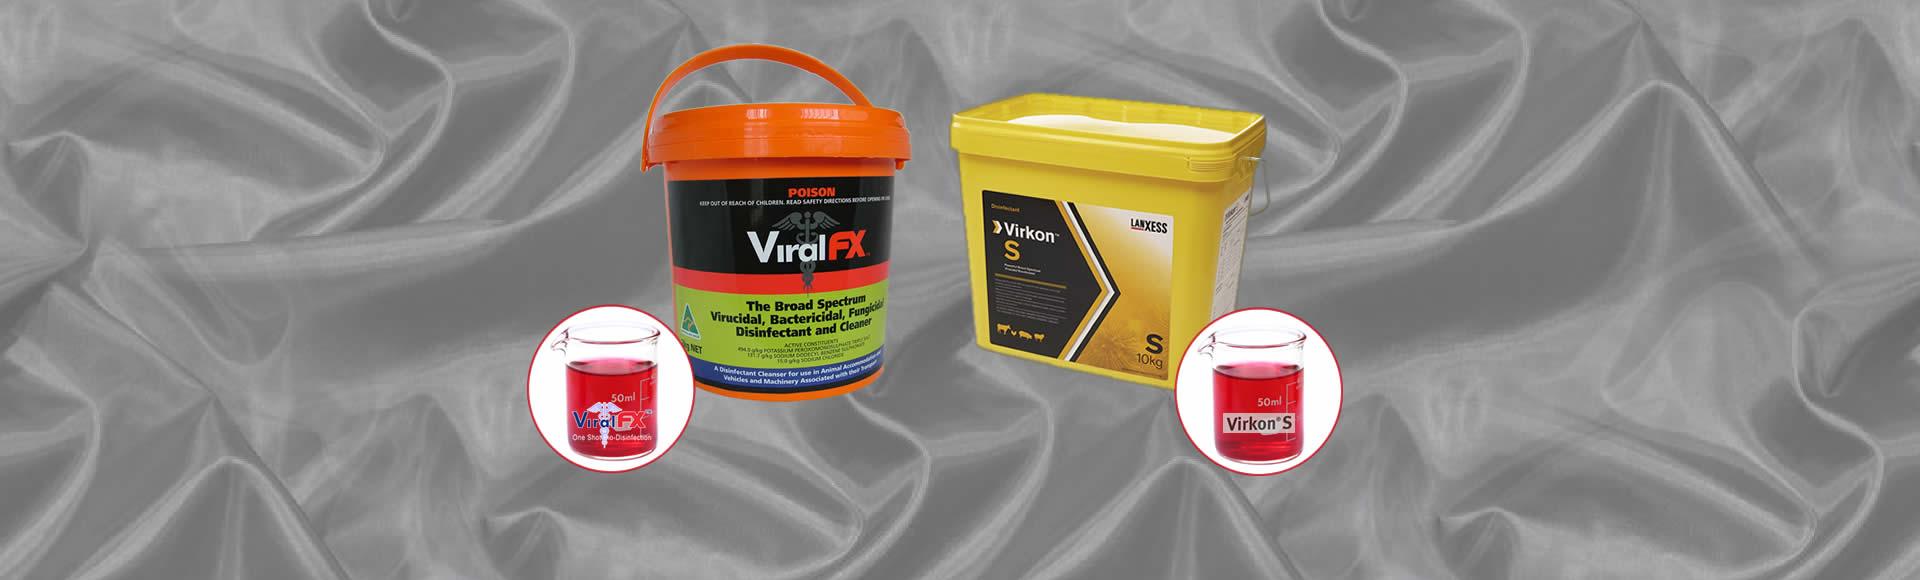 viralfx-vs-virkon-s